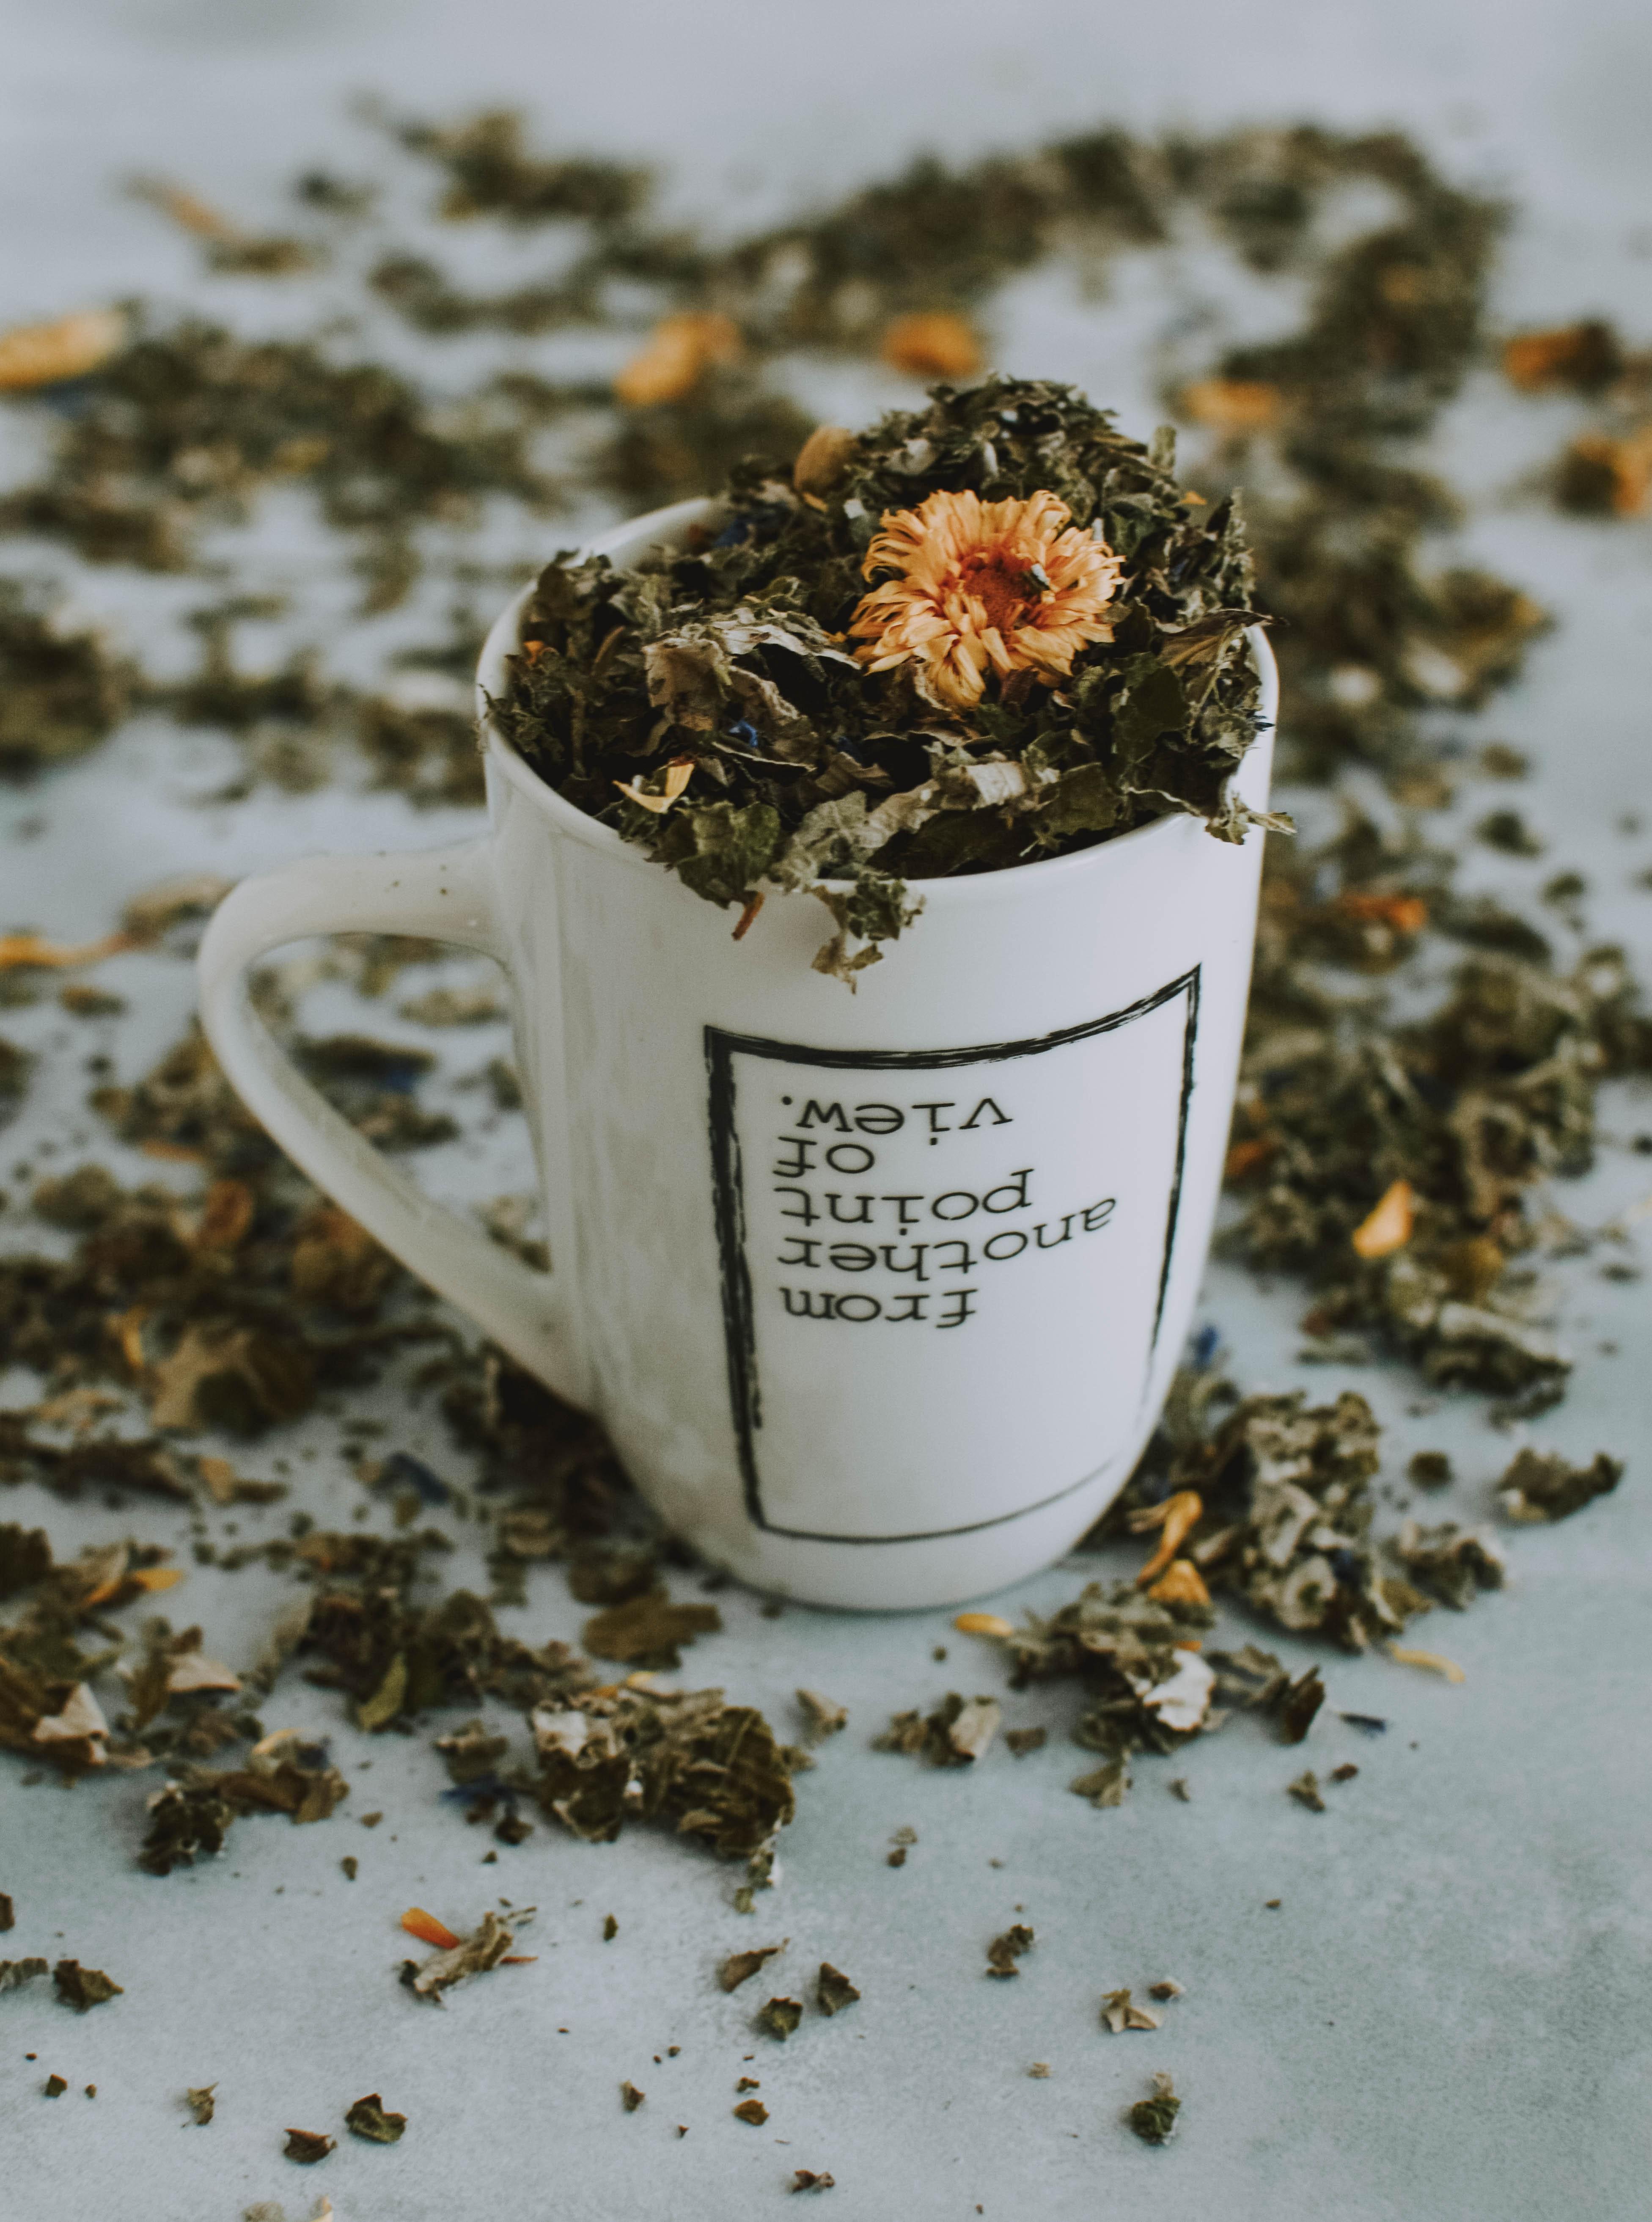 white-and-brown-ceramic-mug-1793034